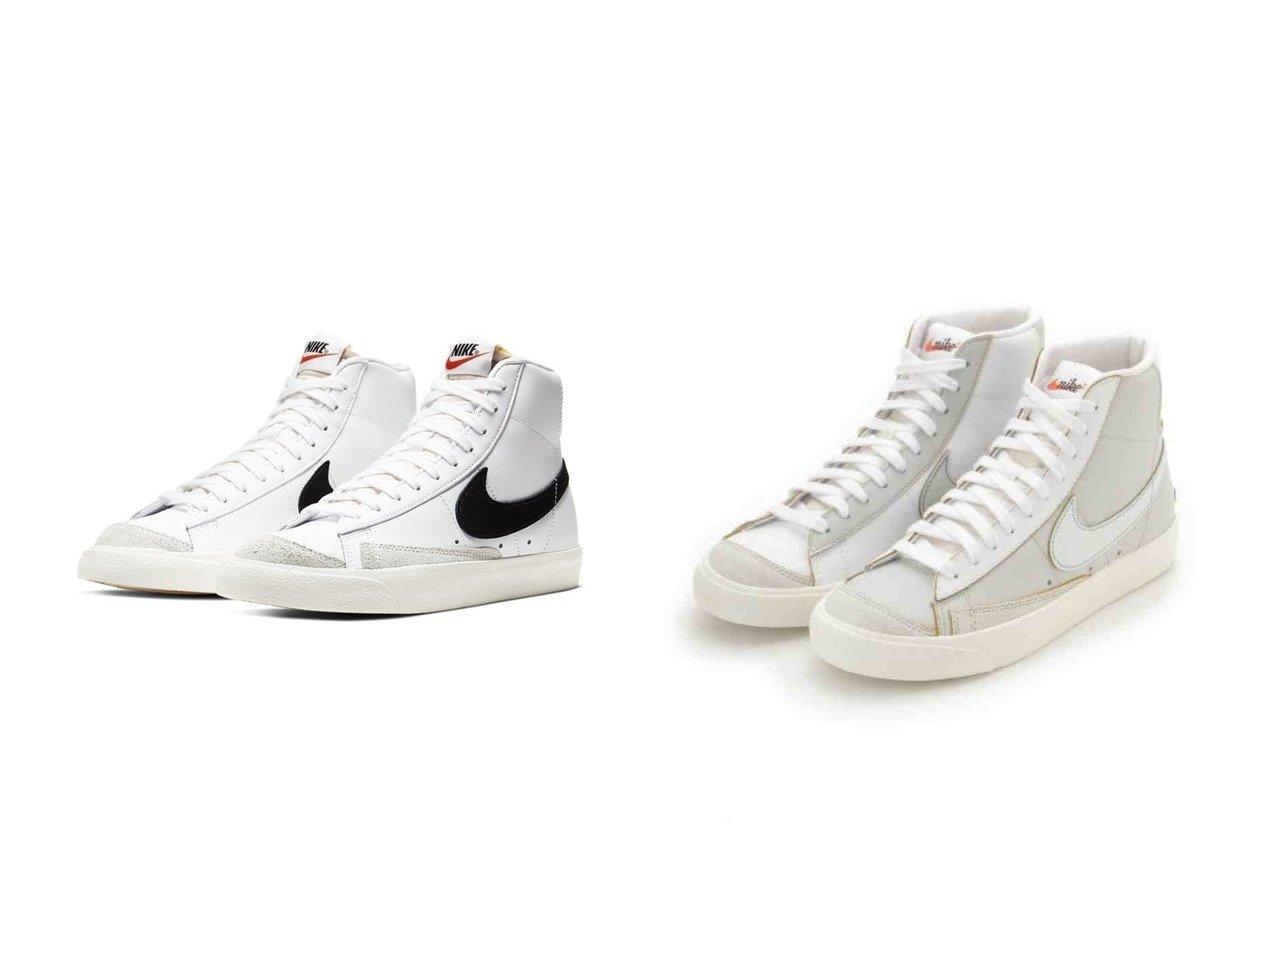 【emmi/エミ】の【NIKE】W BLAZER MID 77&【NIKE】W BLAZER MID 77 シューズ・靴のおすすめ!人気、トレンド・レディースファッションの通販  おすすめで人気の流行・トレンド、ファッションの通販商品 メンズファッション・キッズファッション・インテリア・家具・レディースファッション・服の通販 founy(ファニー) https://founy.com/ ファッション Fashion レディースファッション WOMEN シューズ スエード スニーカー スリッポン ビンテージ 定番  ID:crp329100000009845